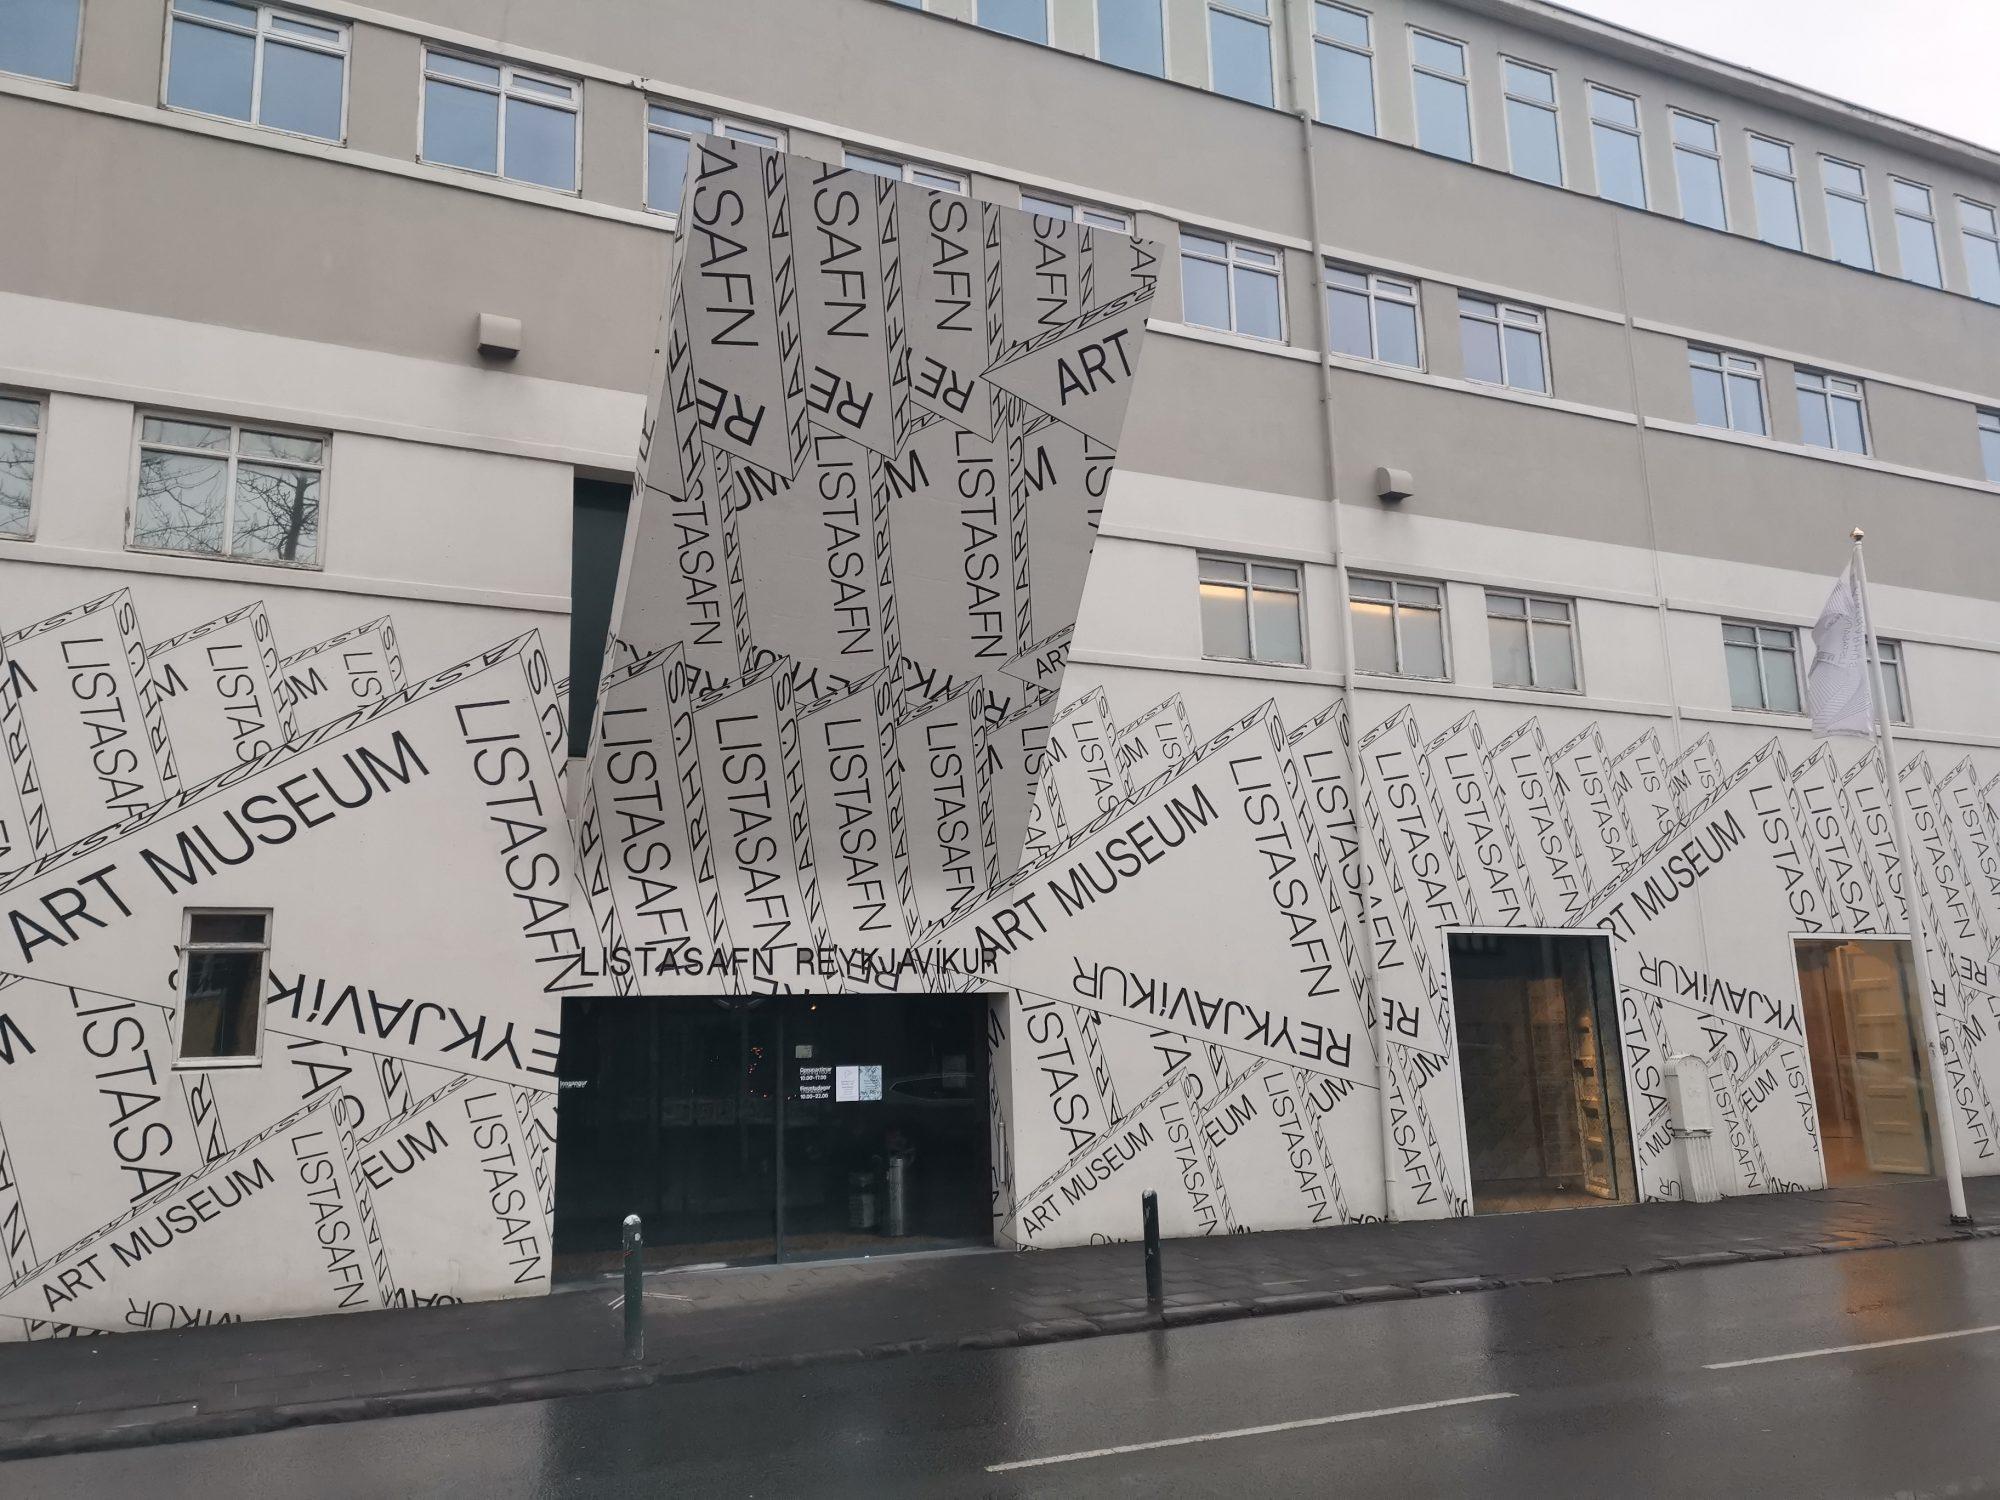 Sightseeing i Reykjavik konstmuseum